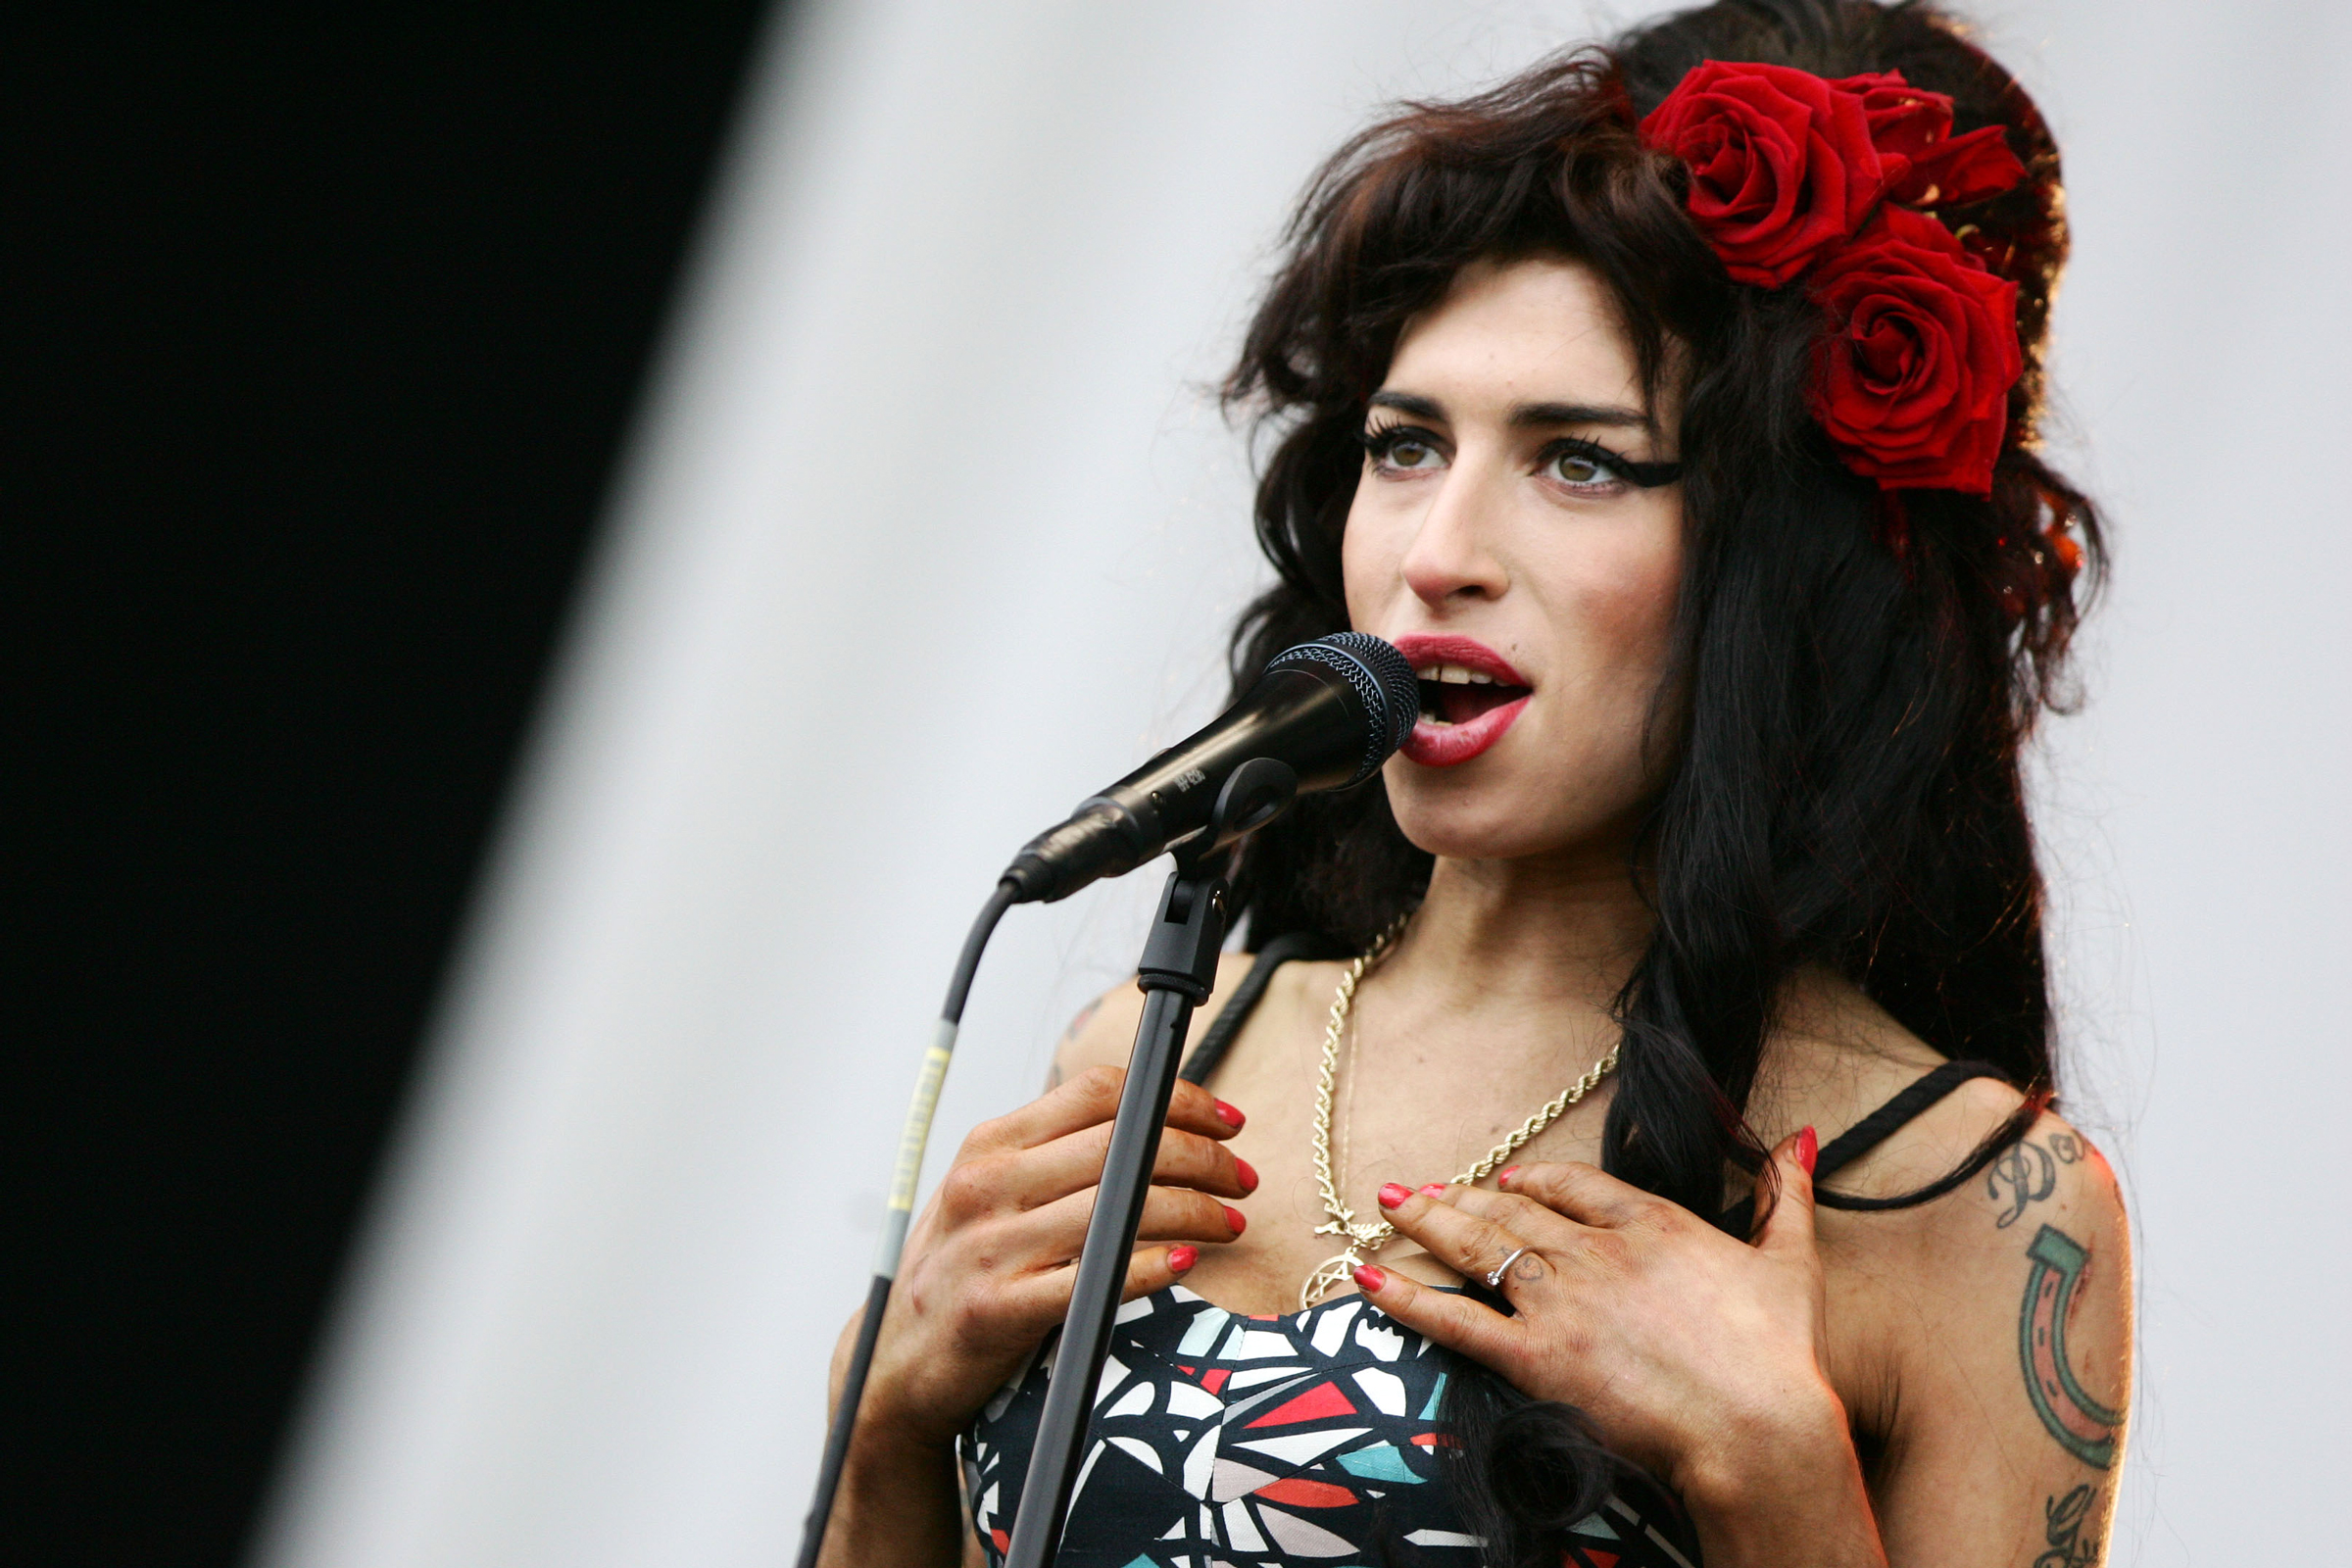 Amy Winehouse Hologram Tour Postponed Due to 'Unique Challenges'